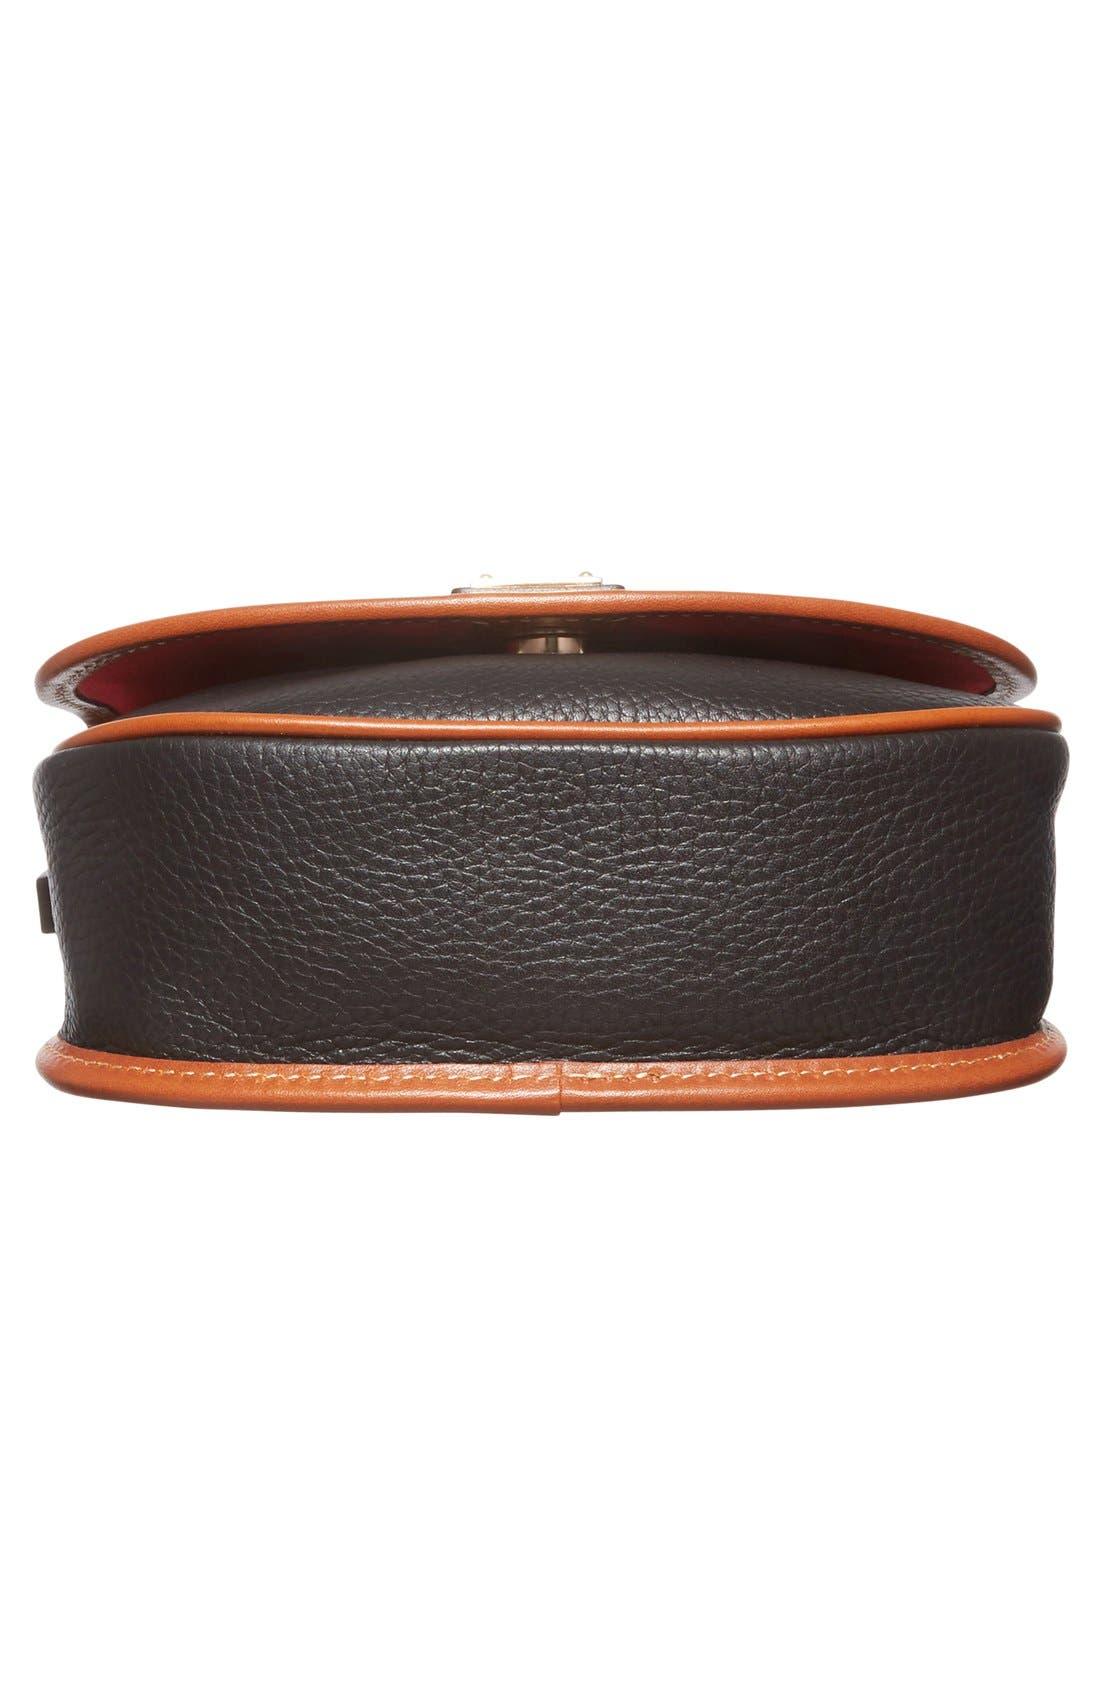 'Hallie' Leather Crossbody Bag,                             Alternate thumbnail 2, color,                             001